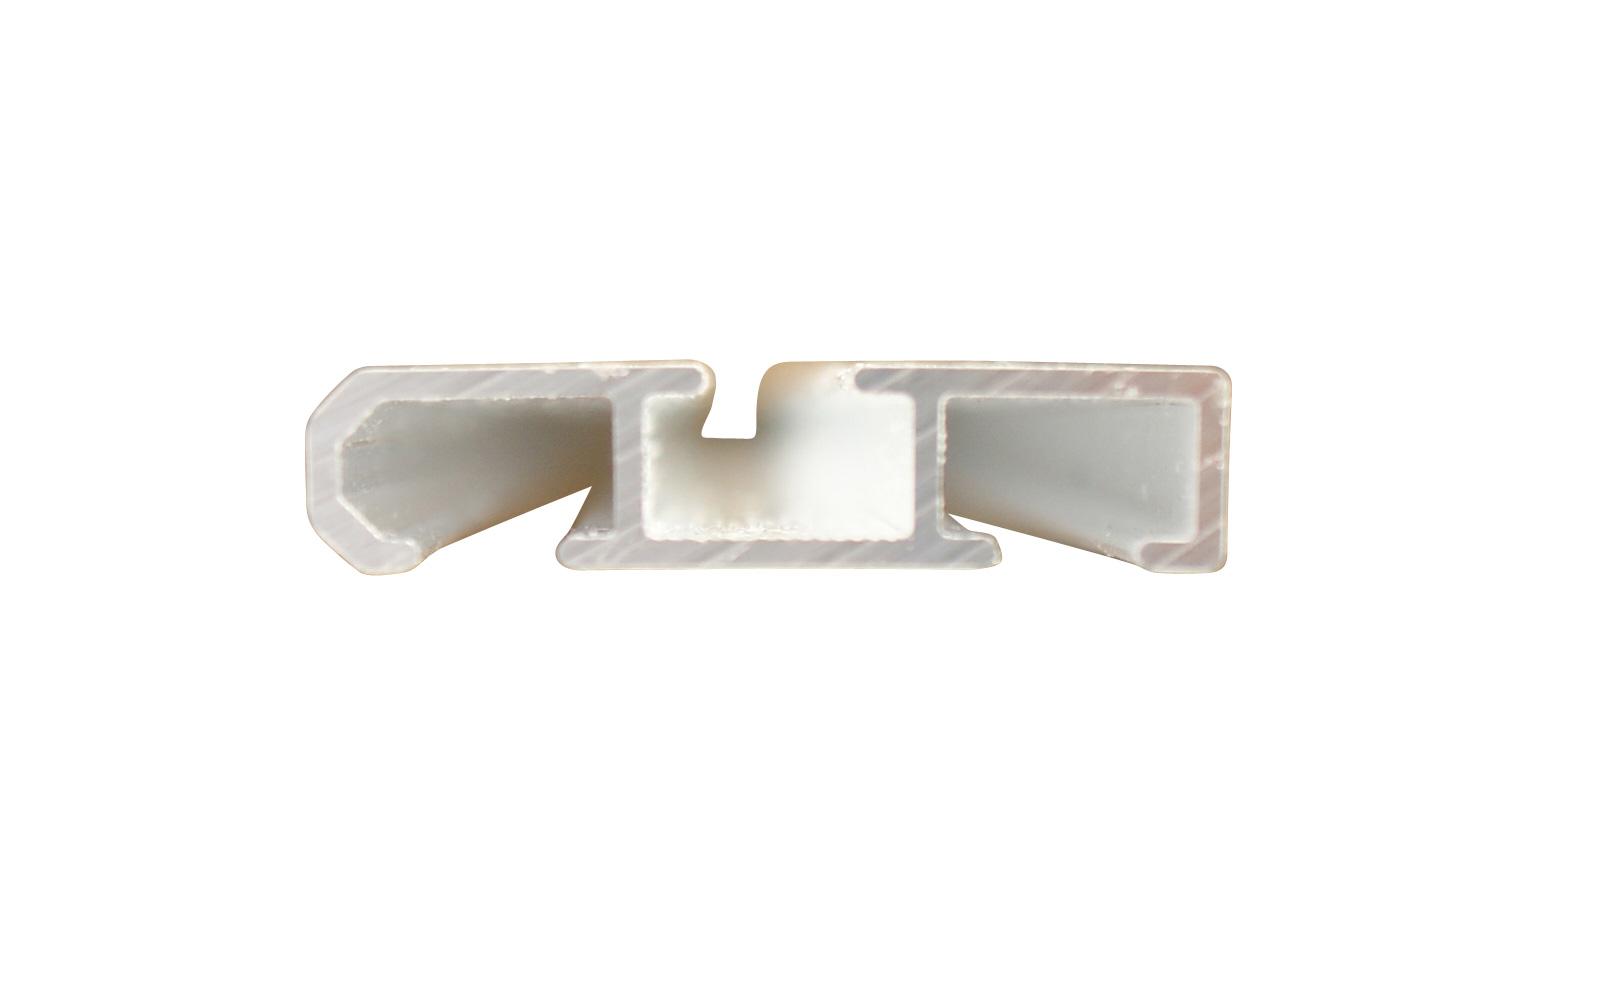 Gardinenschiene silber aus aluminium 2 l ufig for Design couchtisch remember in silber aus aluminium